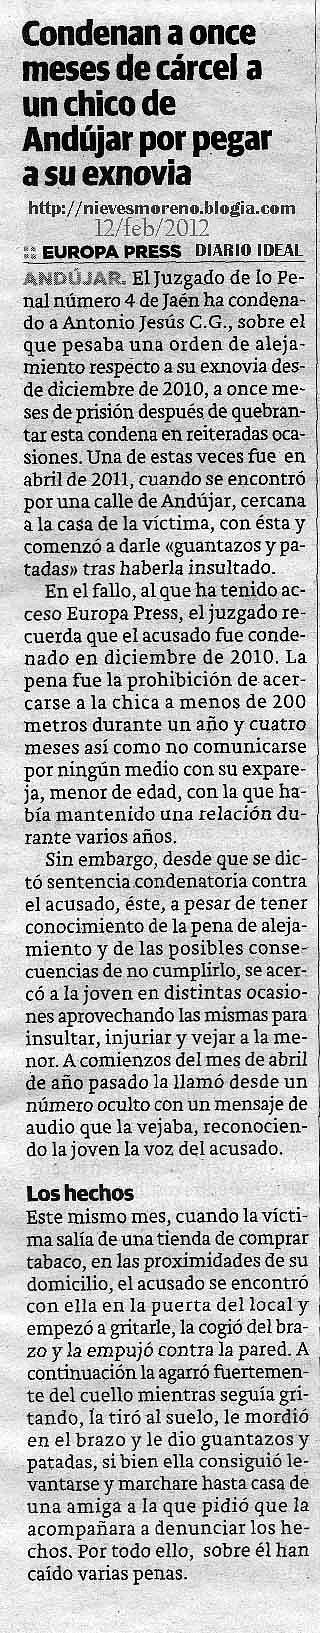 nievesmoreno.blogia.com - Condenan a once meses de cárcel a un chico de Andújar